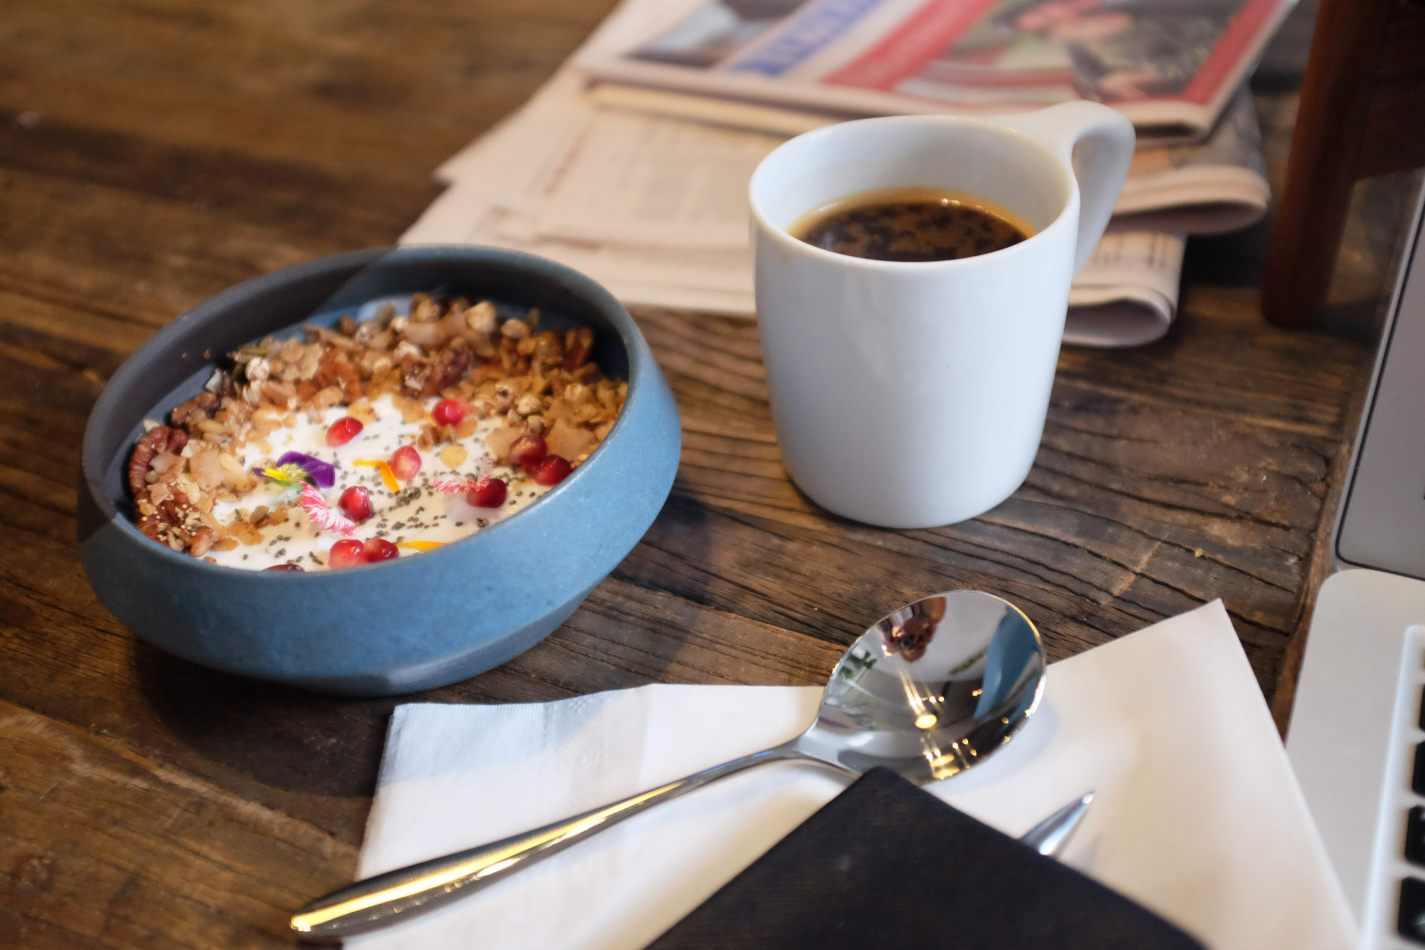 Hibiscus & Nomada : - - Granola Parfait & Coffee at Early Bird Café